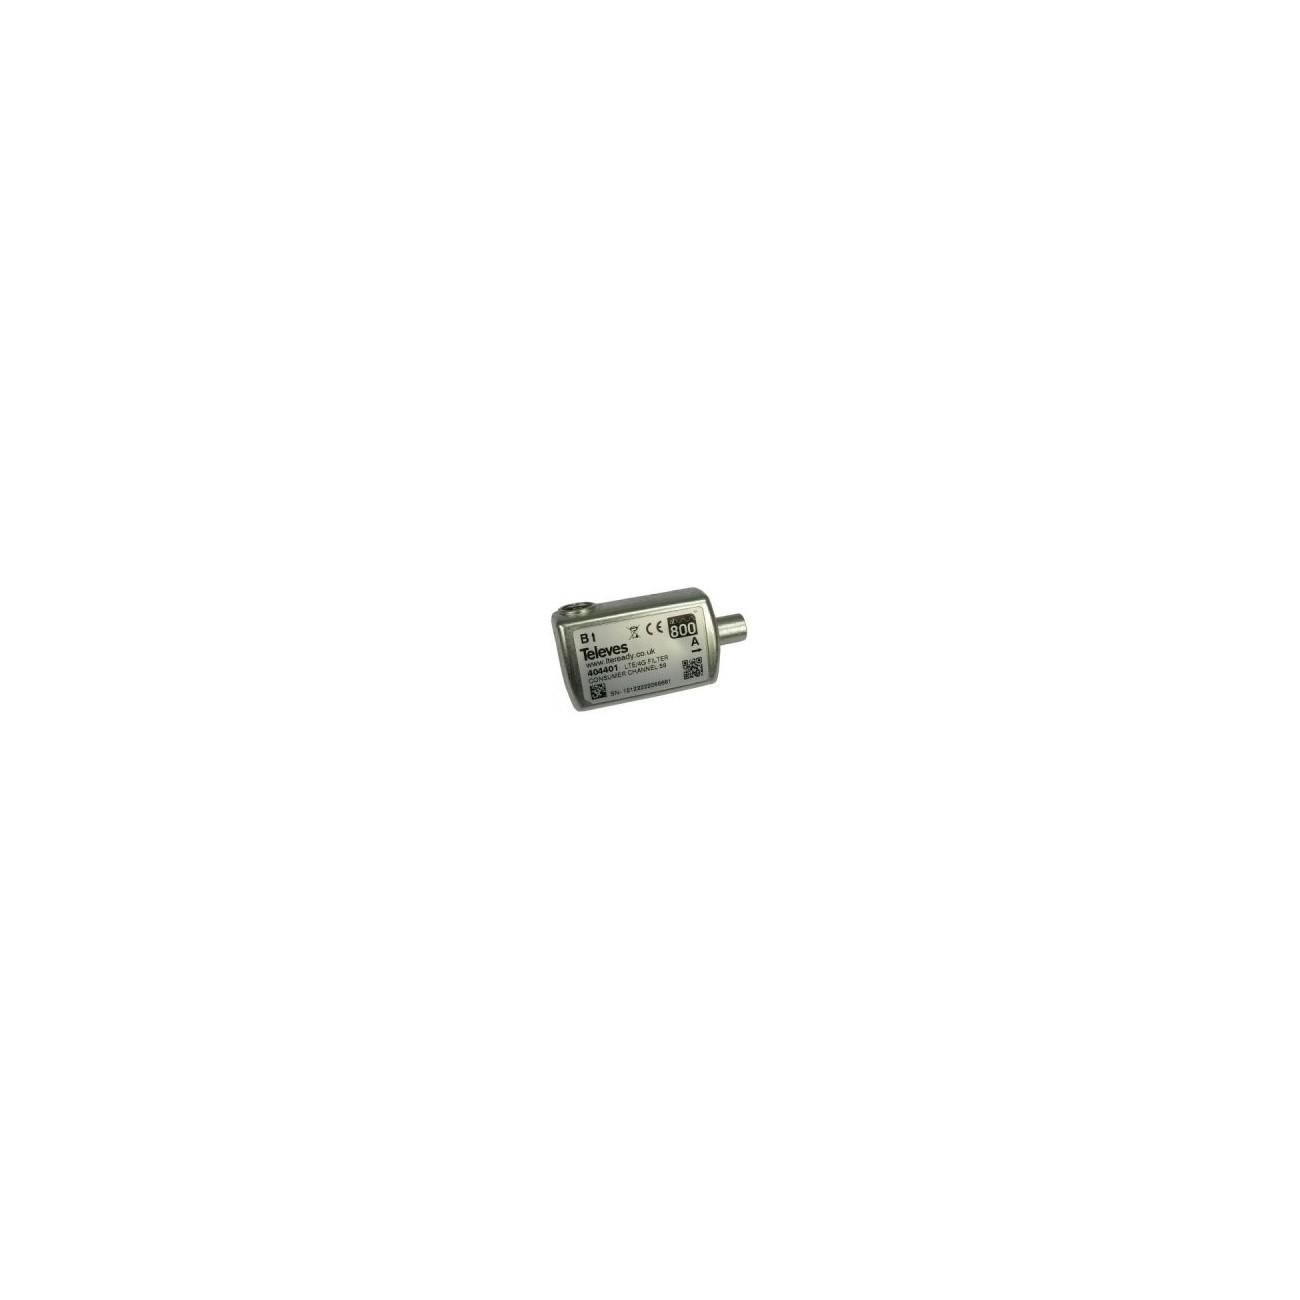 Televes 404411 - Filtro lte cei 470-774mhz c21-58 blister